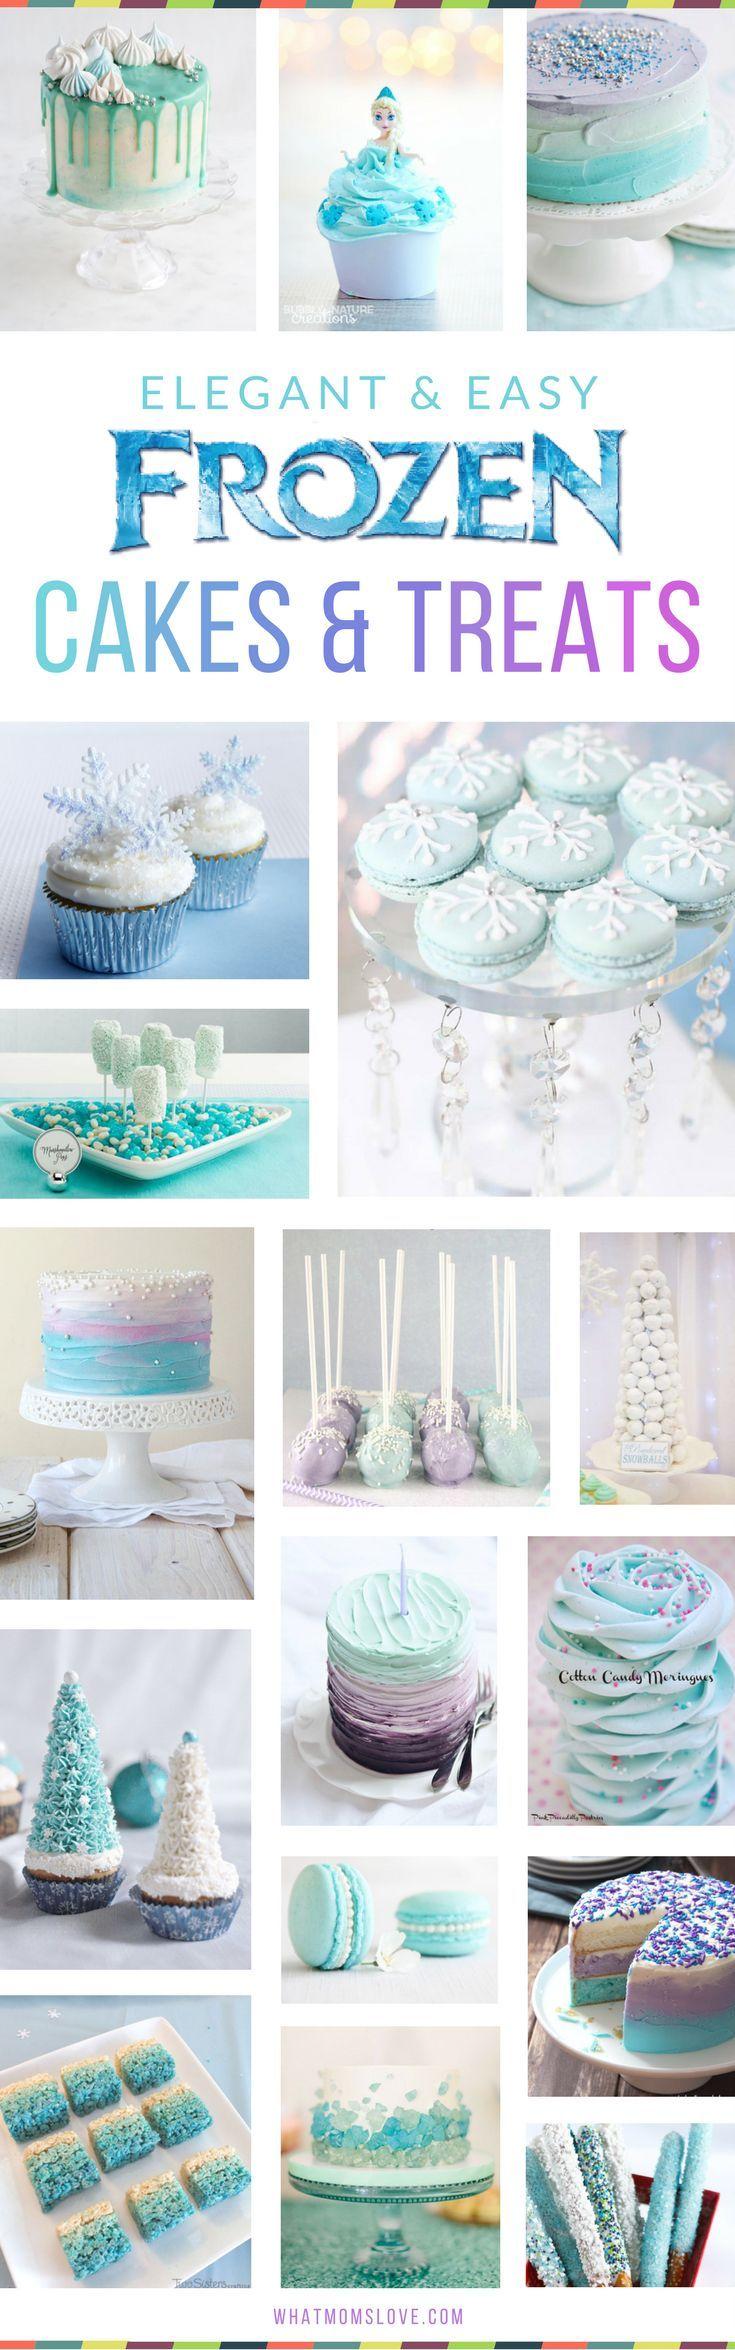 Elegant Frozen-Inspired Cakes & Treats That Would Make Elsa Proud ...